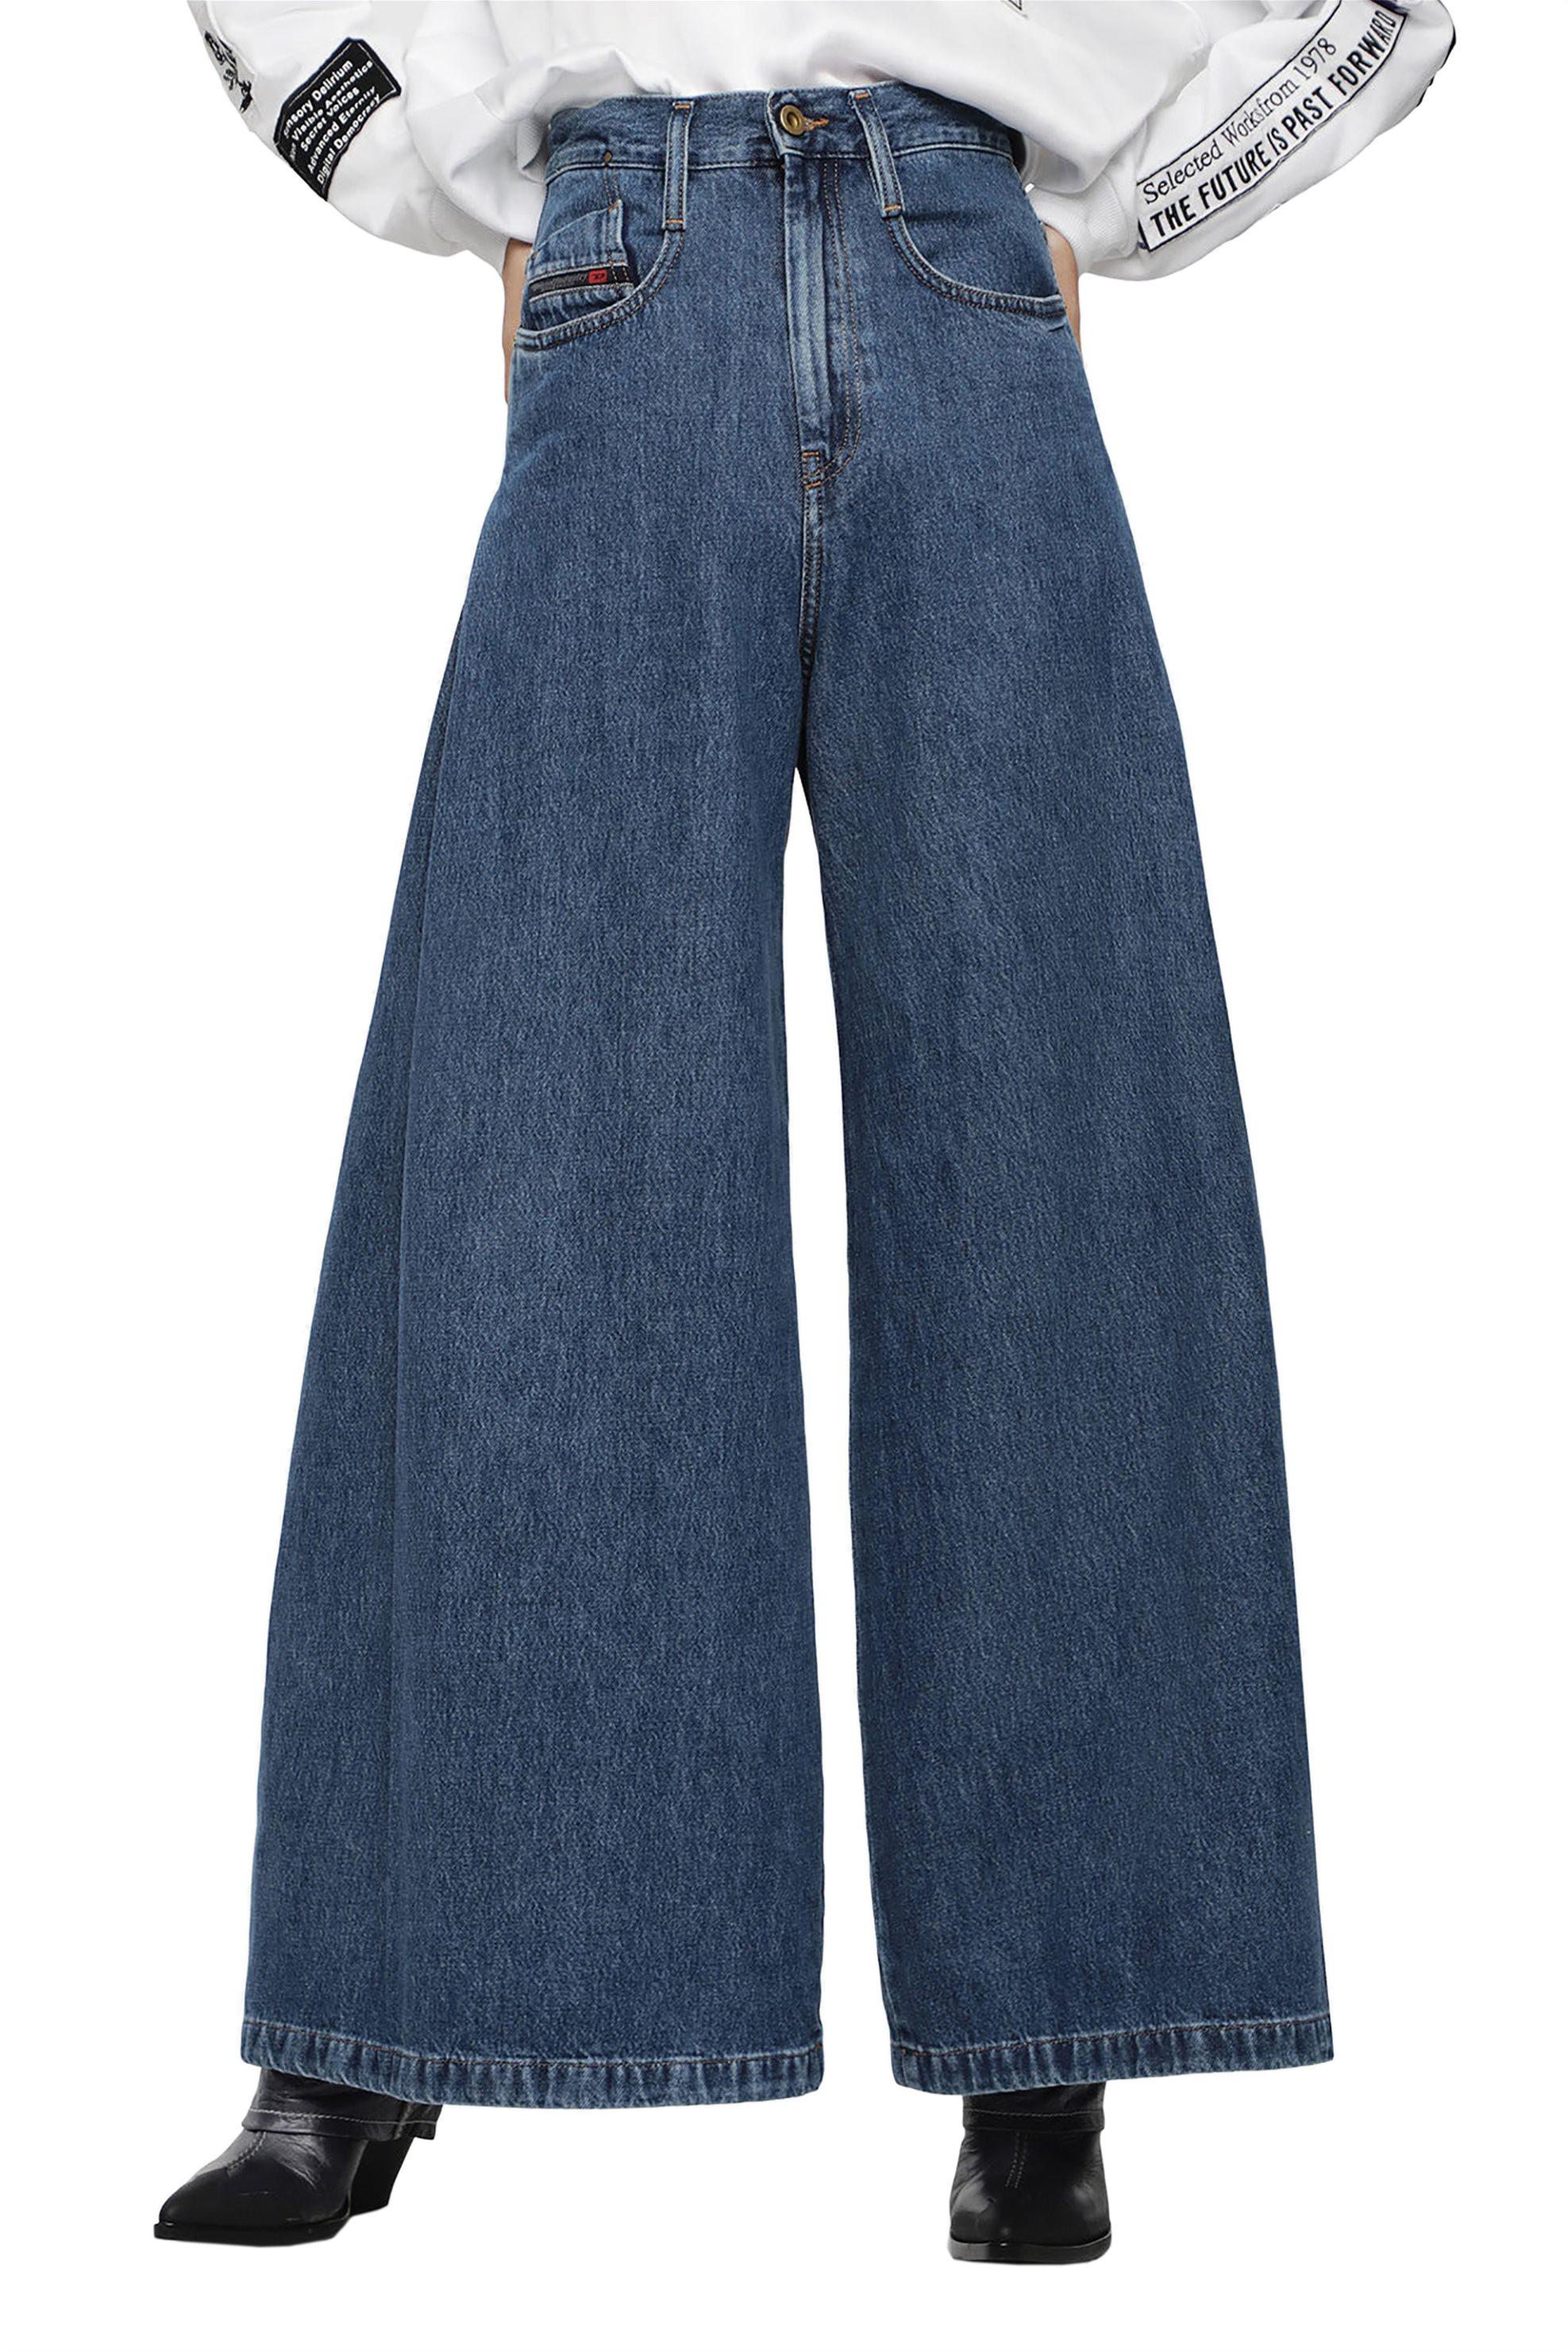 3921d30aafd Γυναικεία Παντελόνια | DIESEL (Ταξινόμηση: Ακριβότερα) | Snif.gr